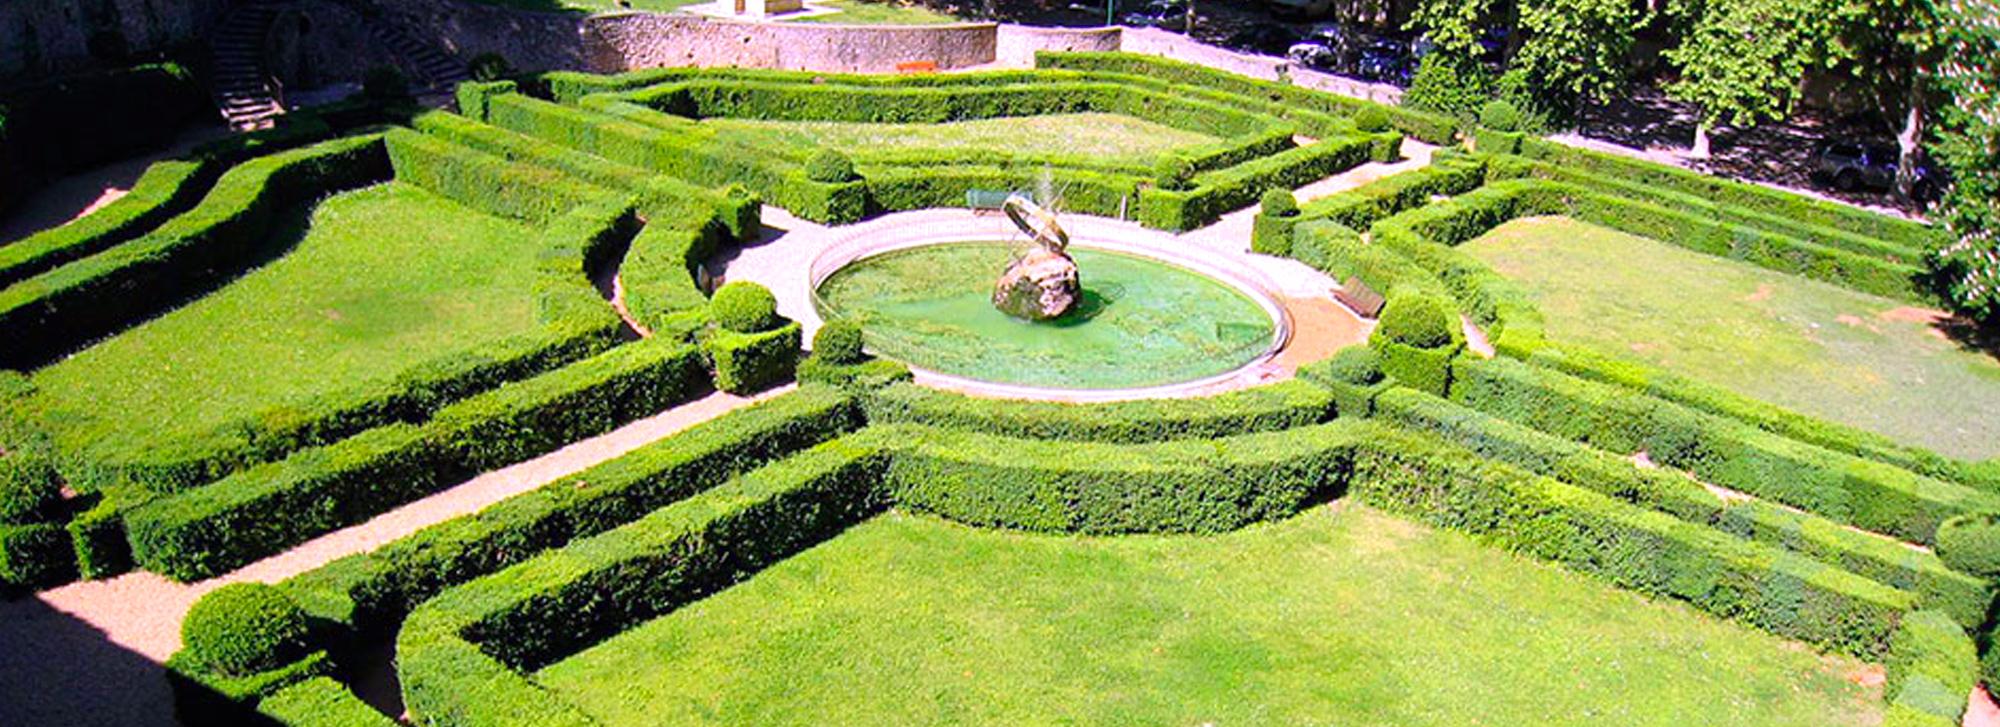 Planting, Garden and Landscape Designs